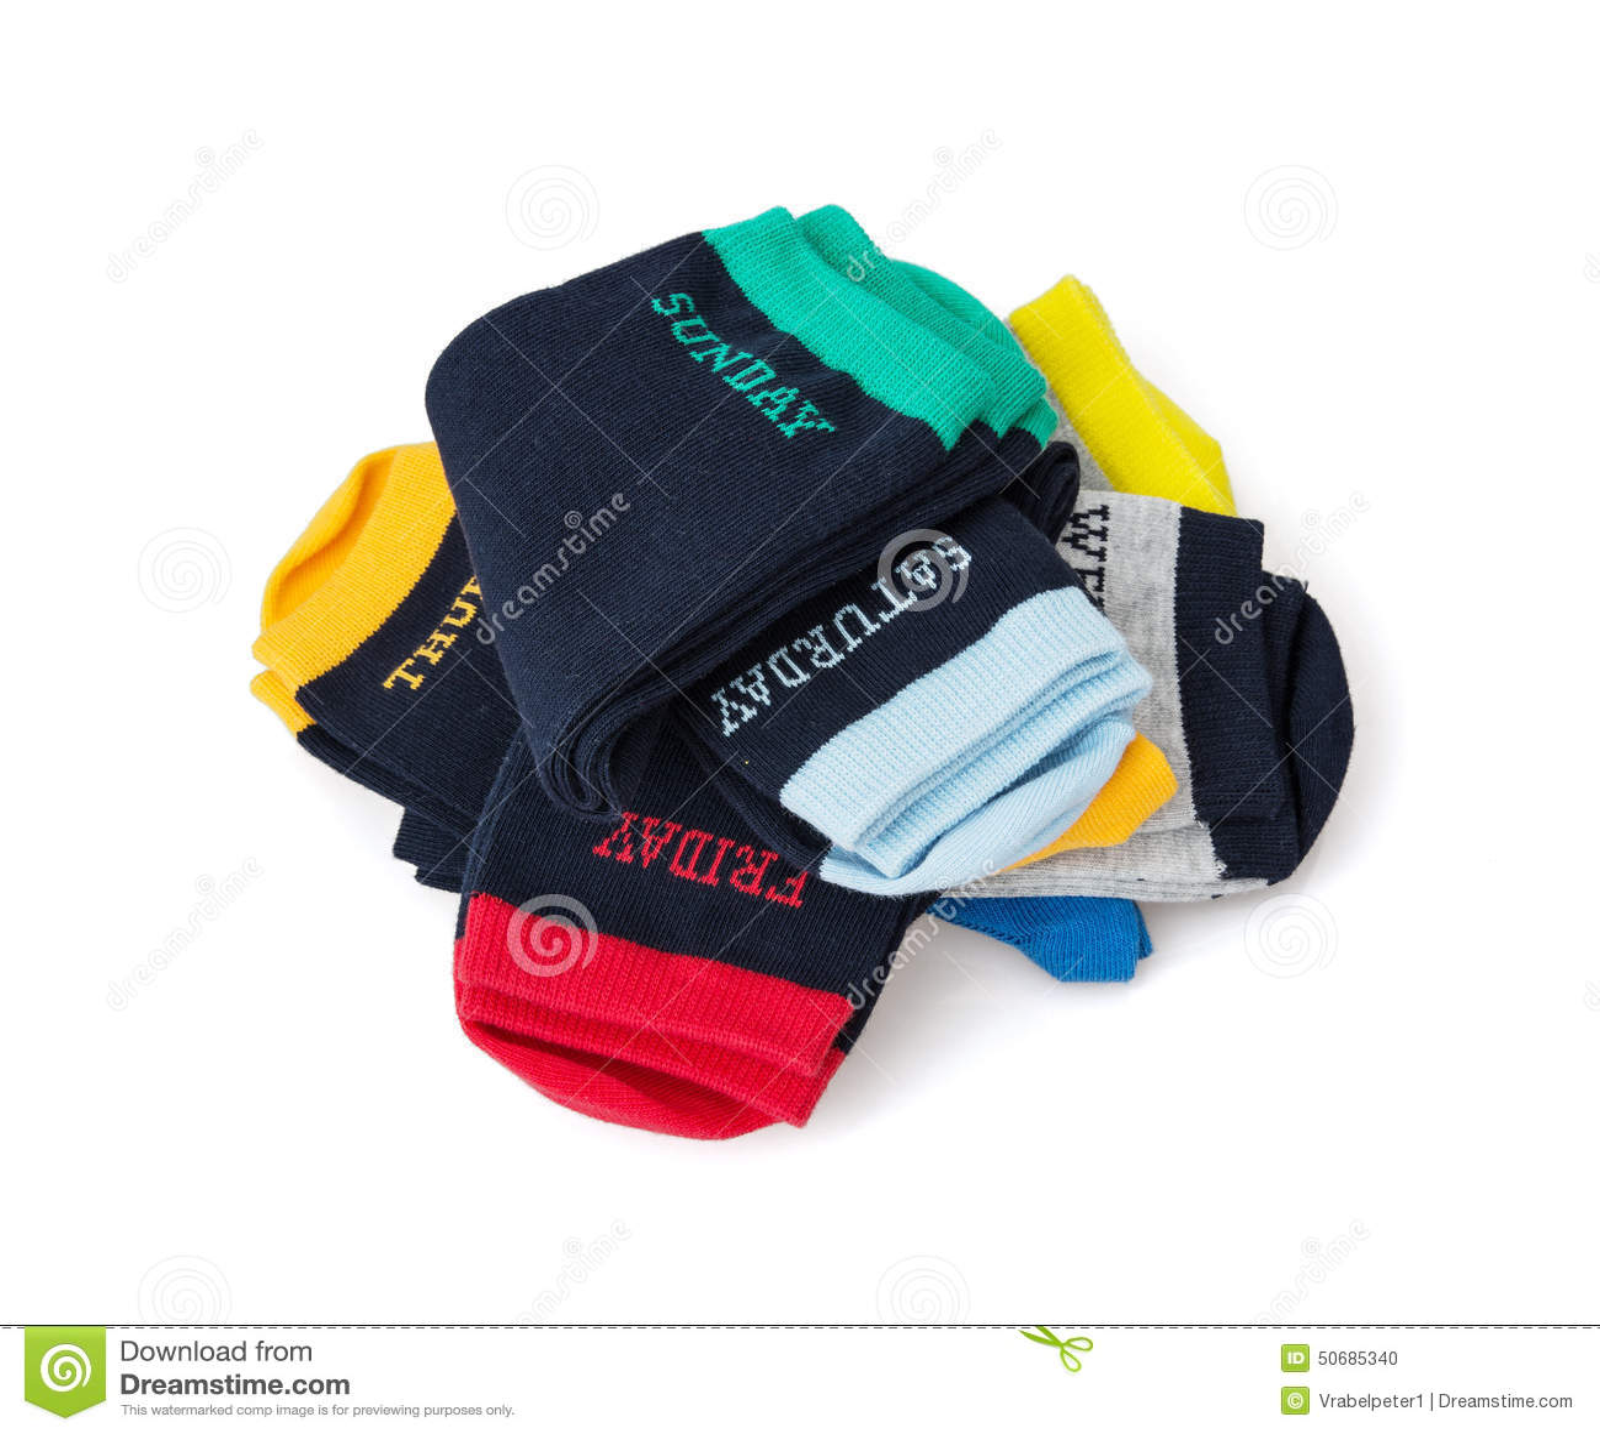 Download 与天的题字的滑稽的袜子在白色ba的 库存照片. 图片 包括有 子项, 星期六, 幽默, 滑稽, 赞誉, 星期一 - 50685340